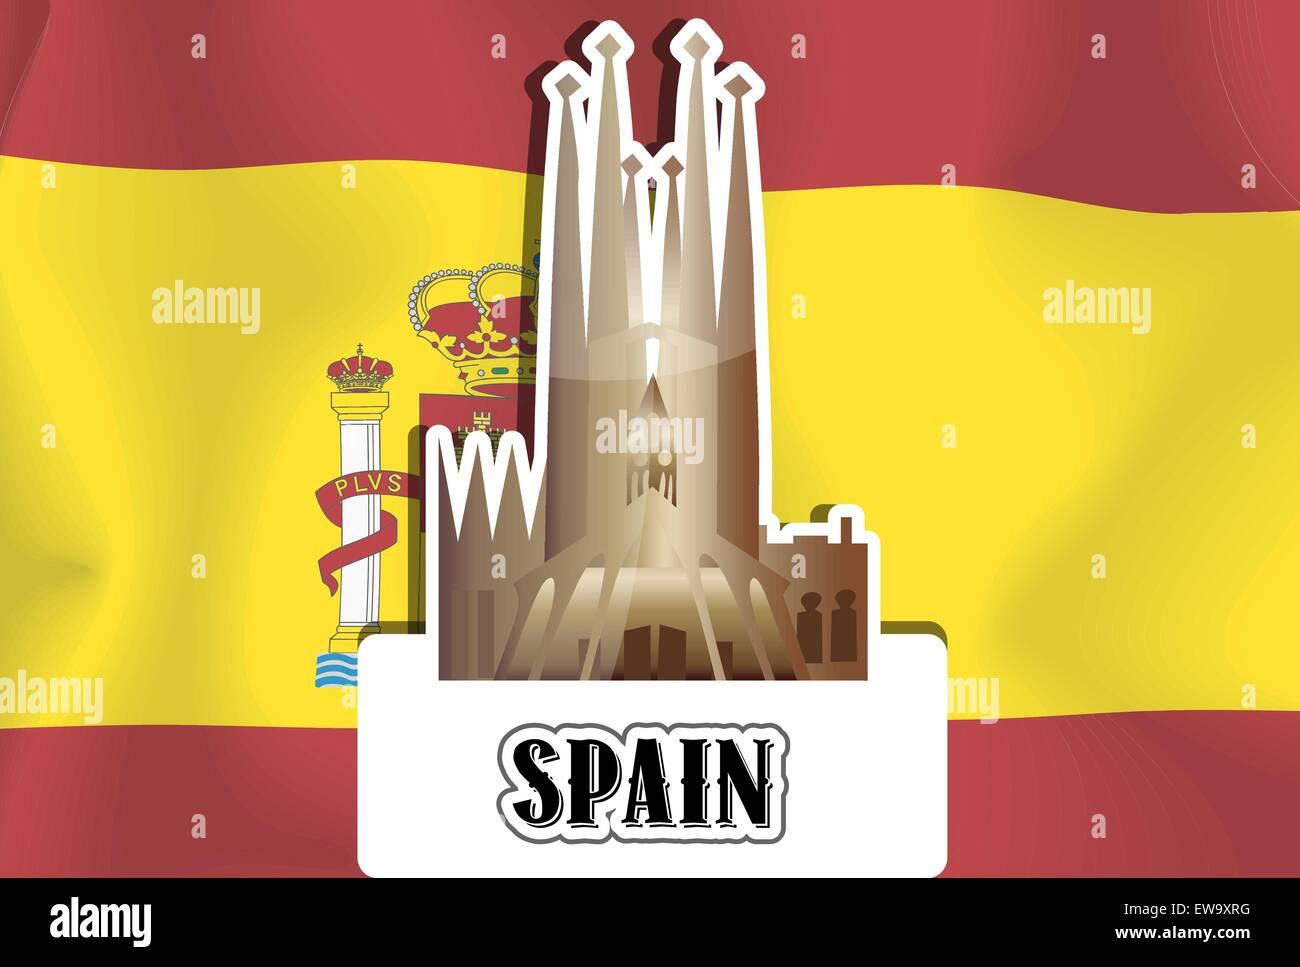 spain spanish flag sagrada familia basilica vector illustration